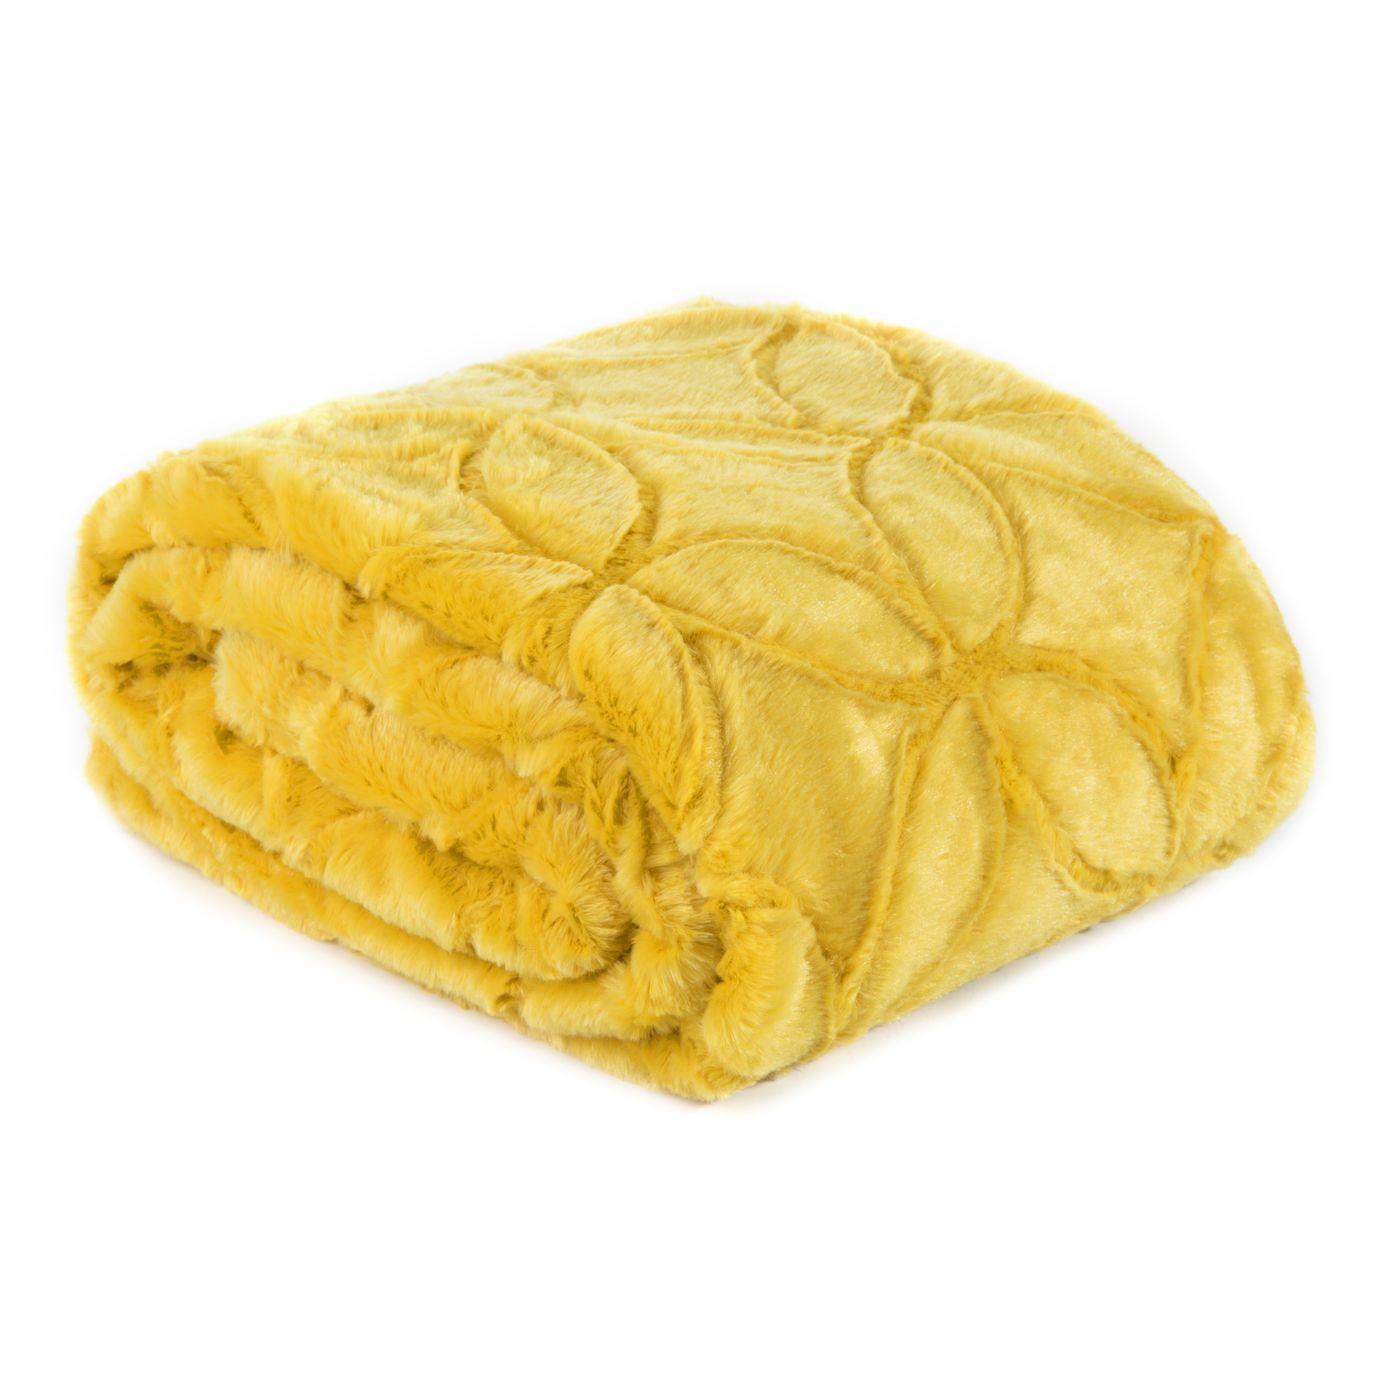 Narzuta futerko na łóżko musztardowa 170x210 cm